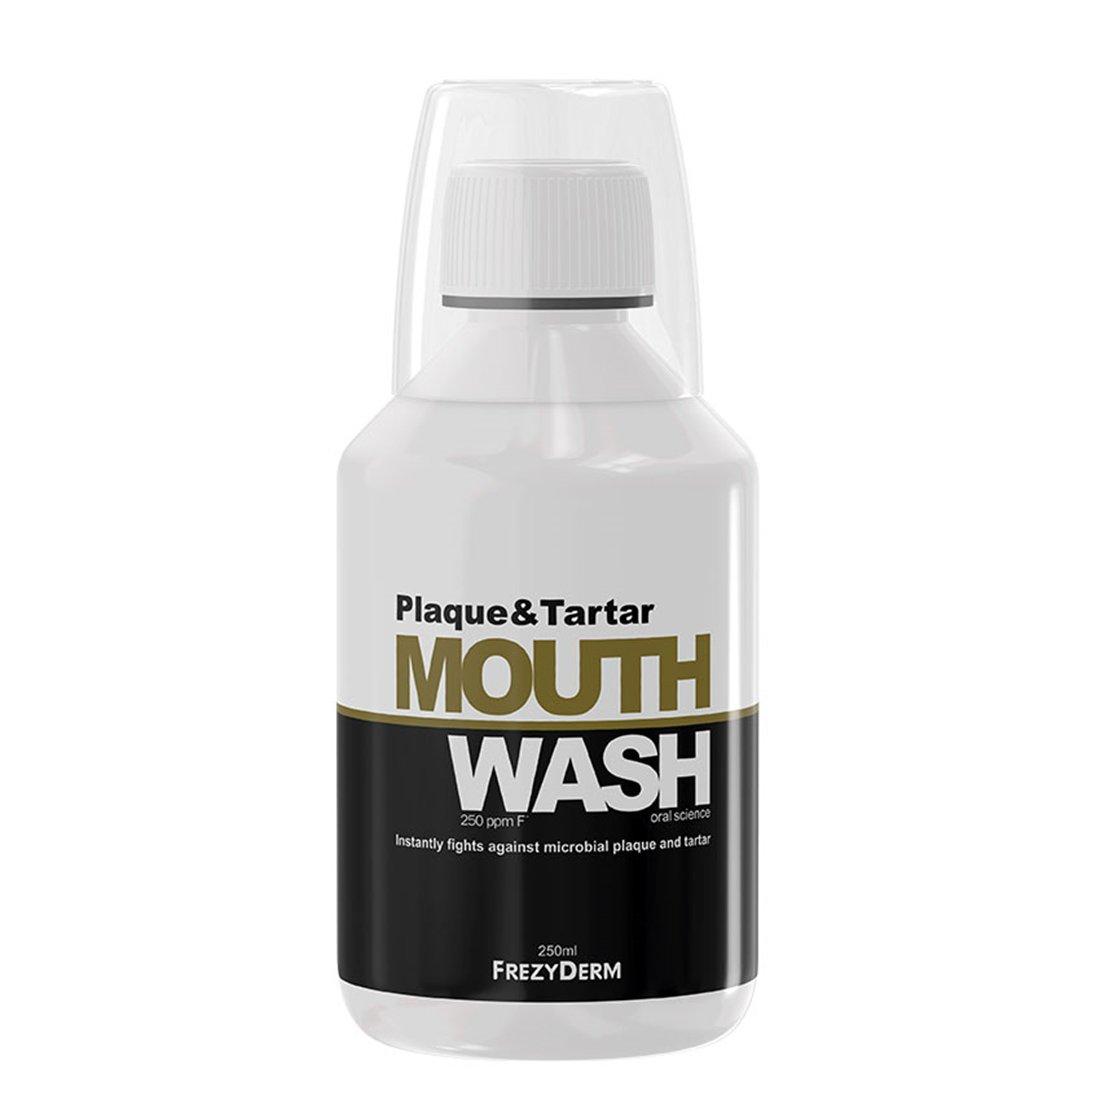 Frezyderm Plaque & Tartar Mouthwash Φθοριούχο Στοματικό Διάλυμα για την Καθημερινή Φροντίδα 250ml